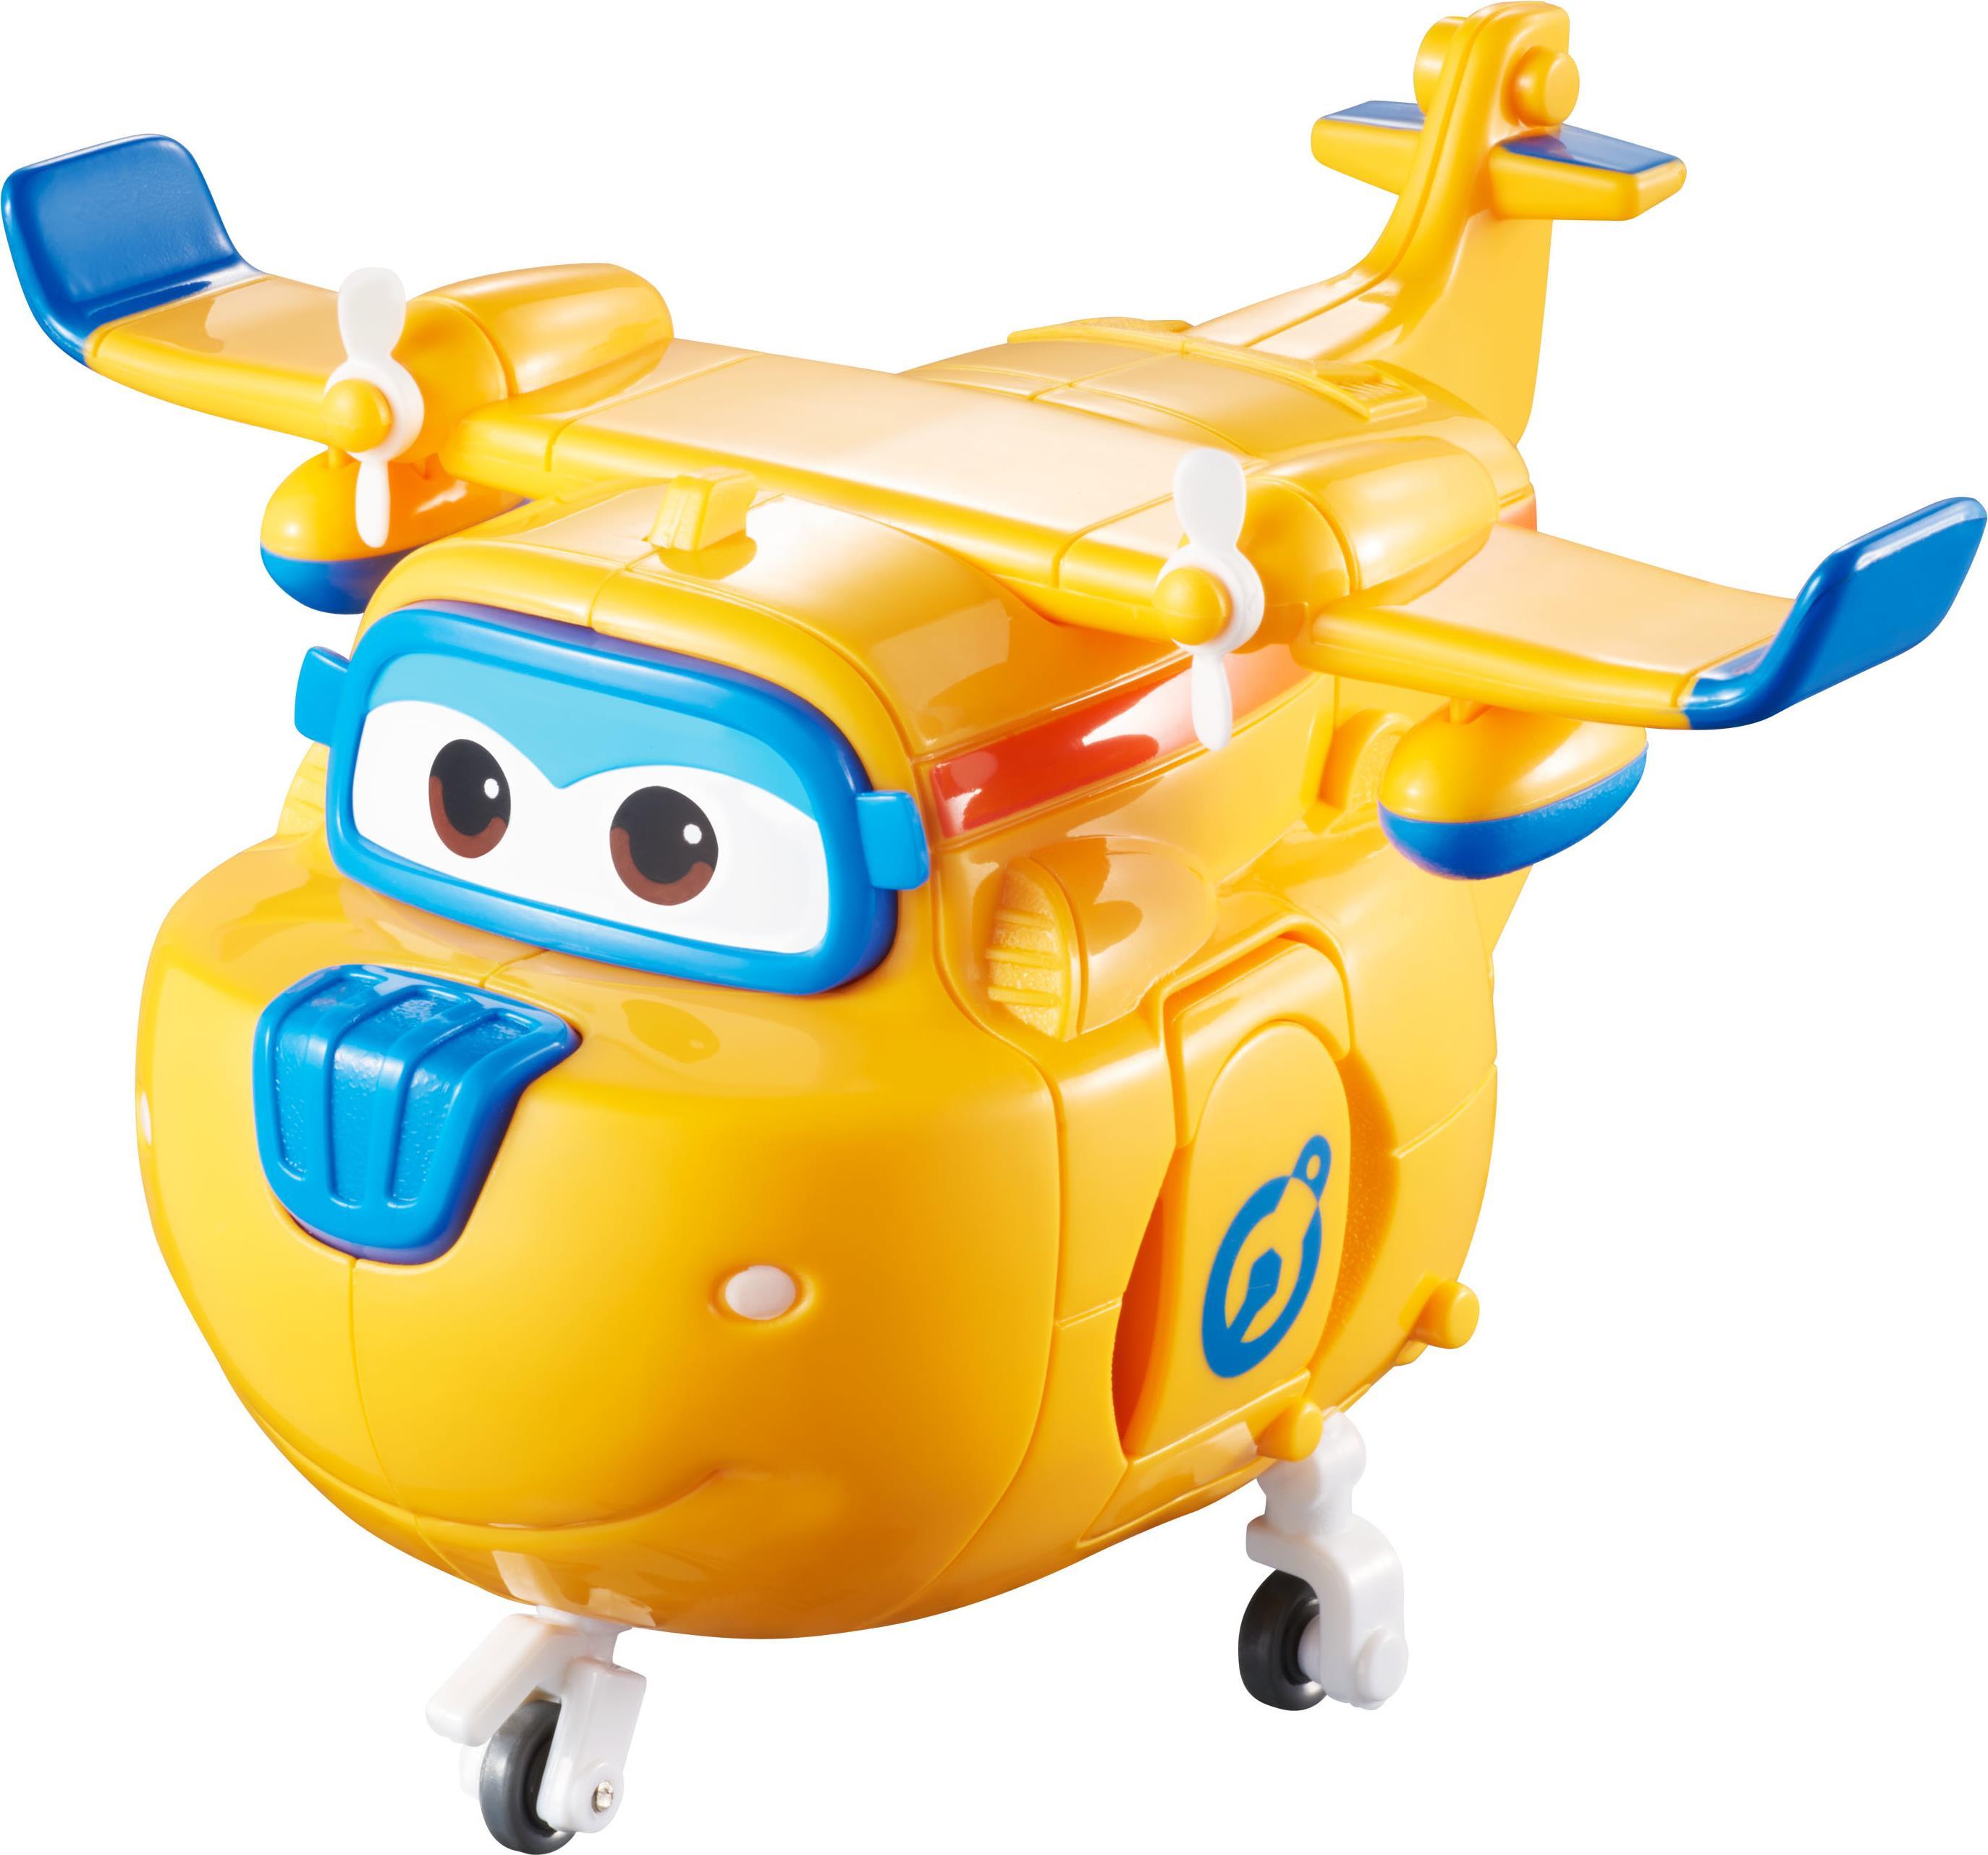 Alpha Animation & Toys Super Wings Transforming Donnie - Blau - Orange - 4 Jahr(e) - 9 Jahr(e) - Junge/Mädchen - Innenra